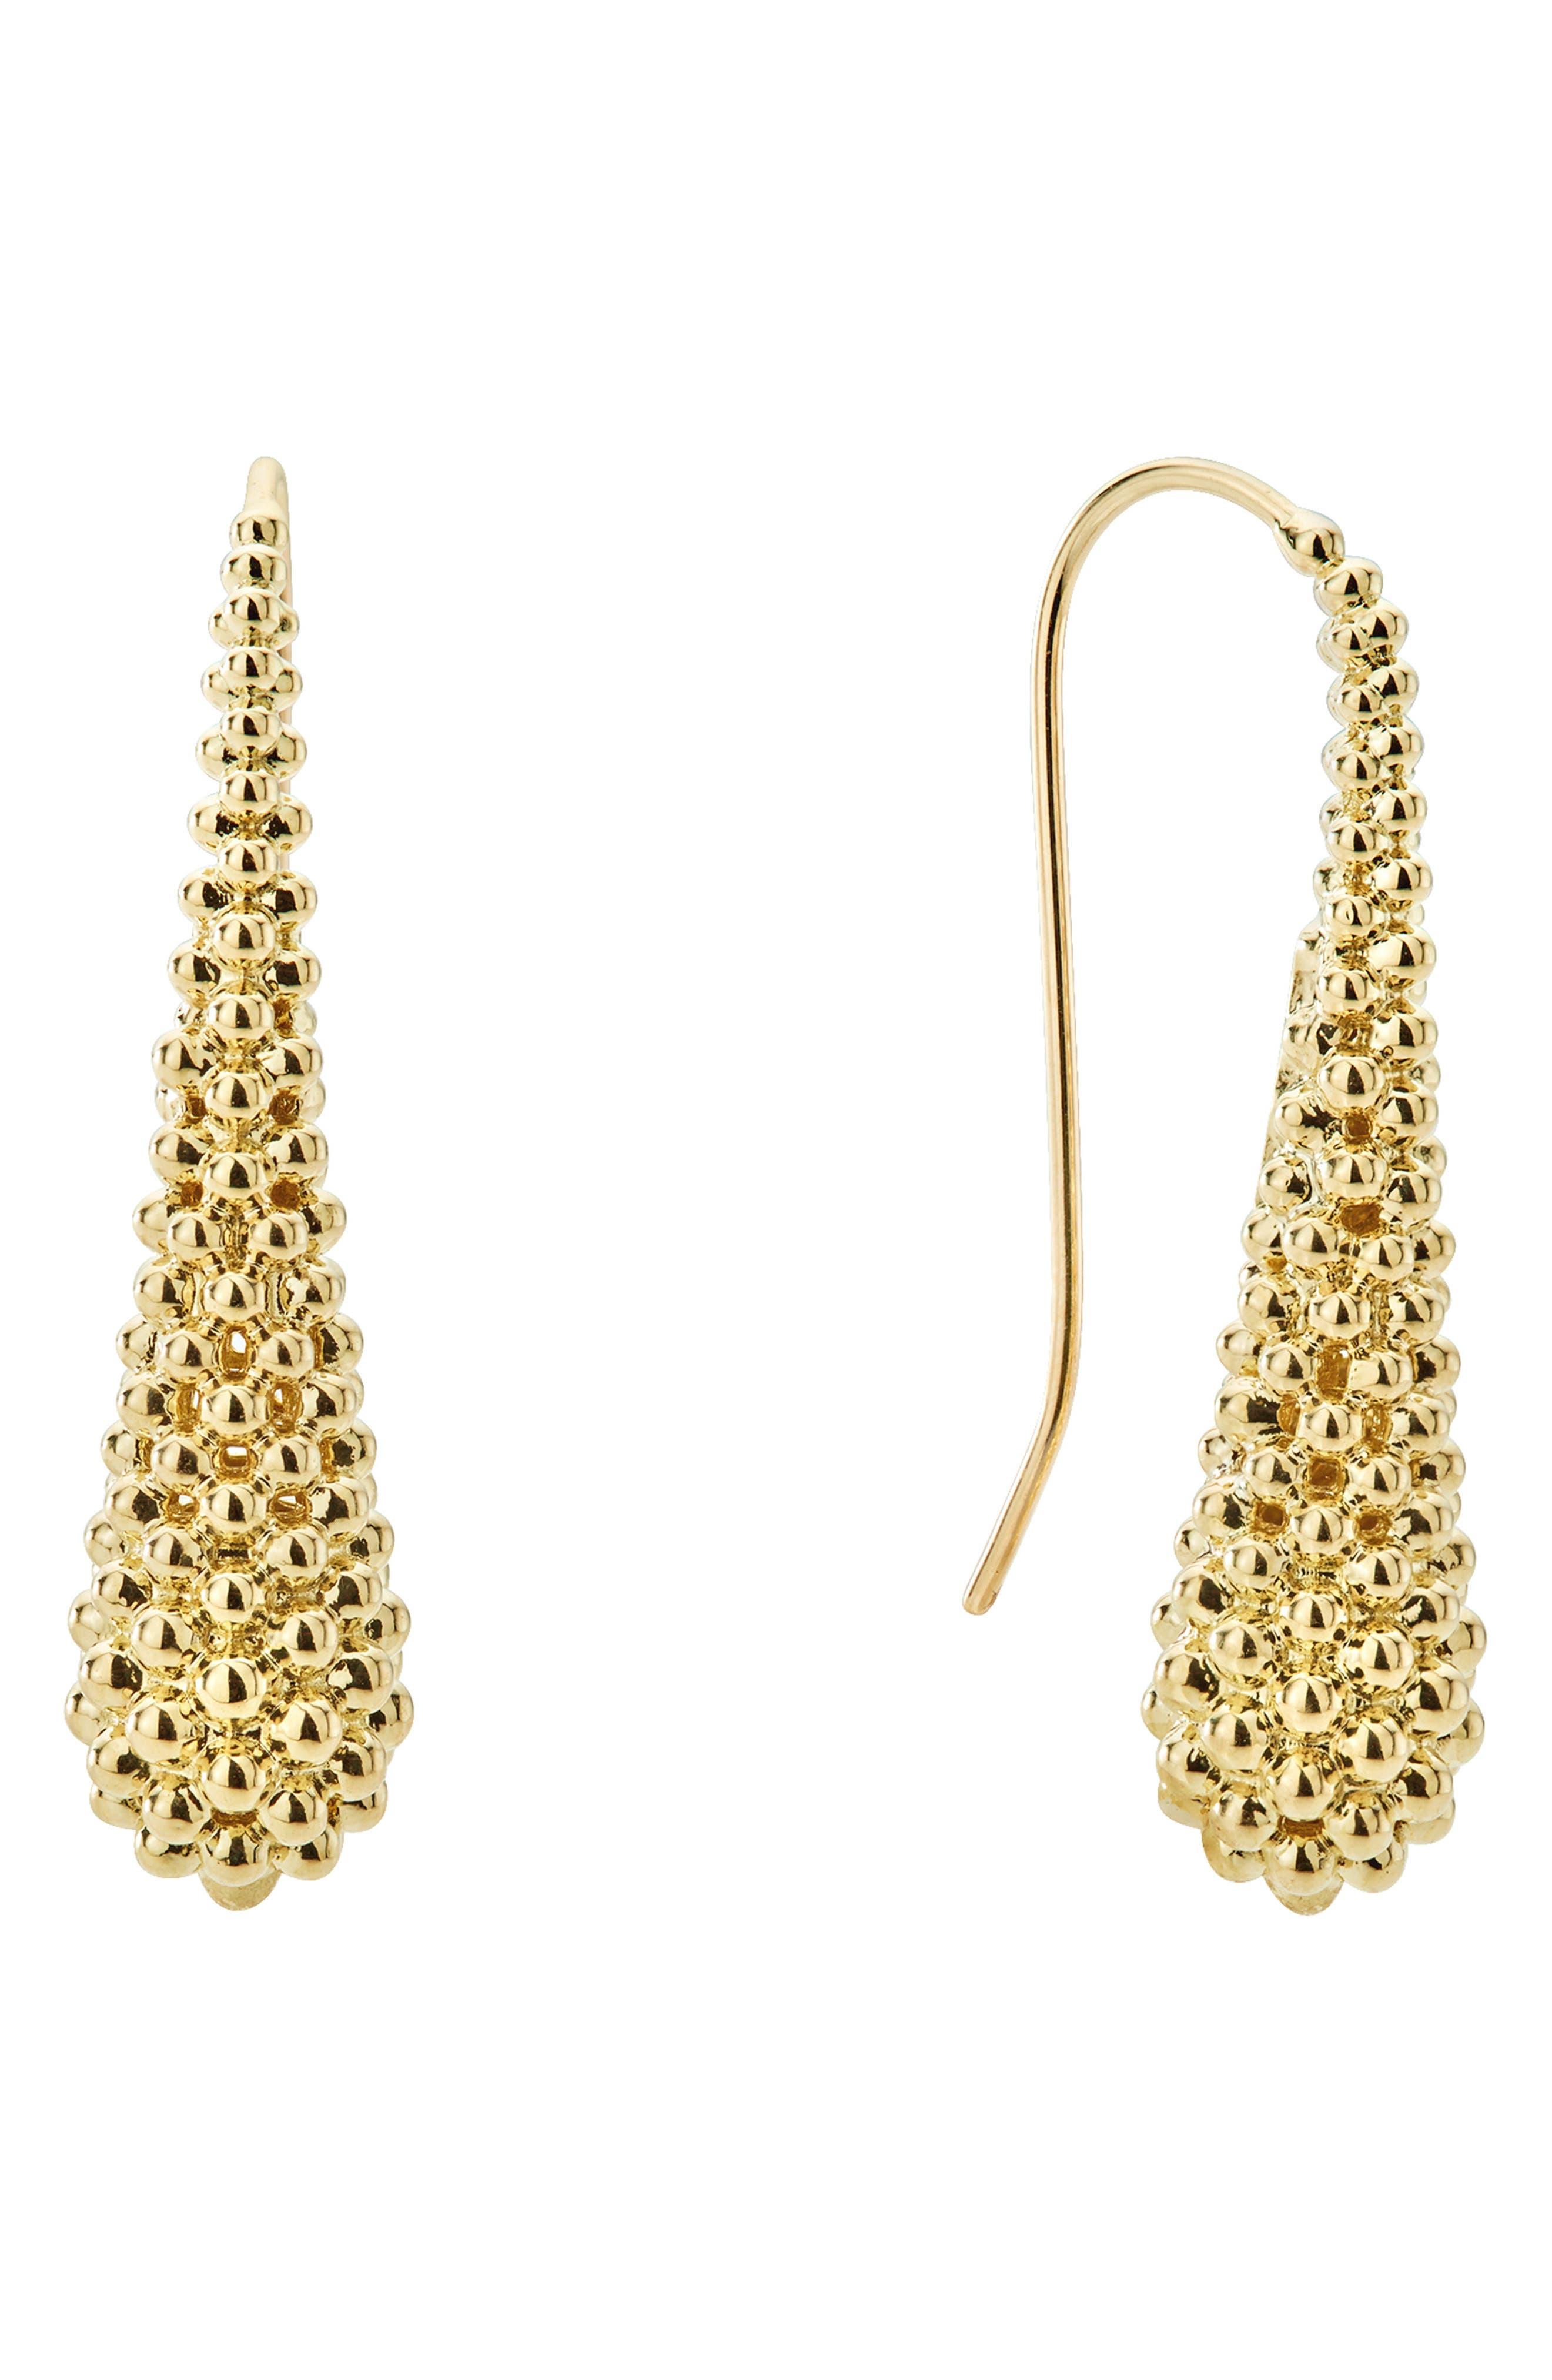 Caviar Gold Teardrop Earrings,                         Main,                         color, GOLD